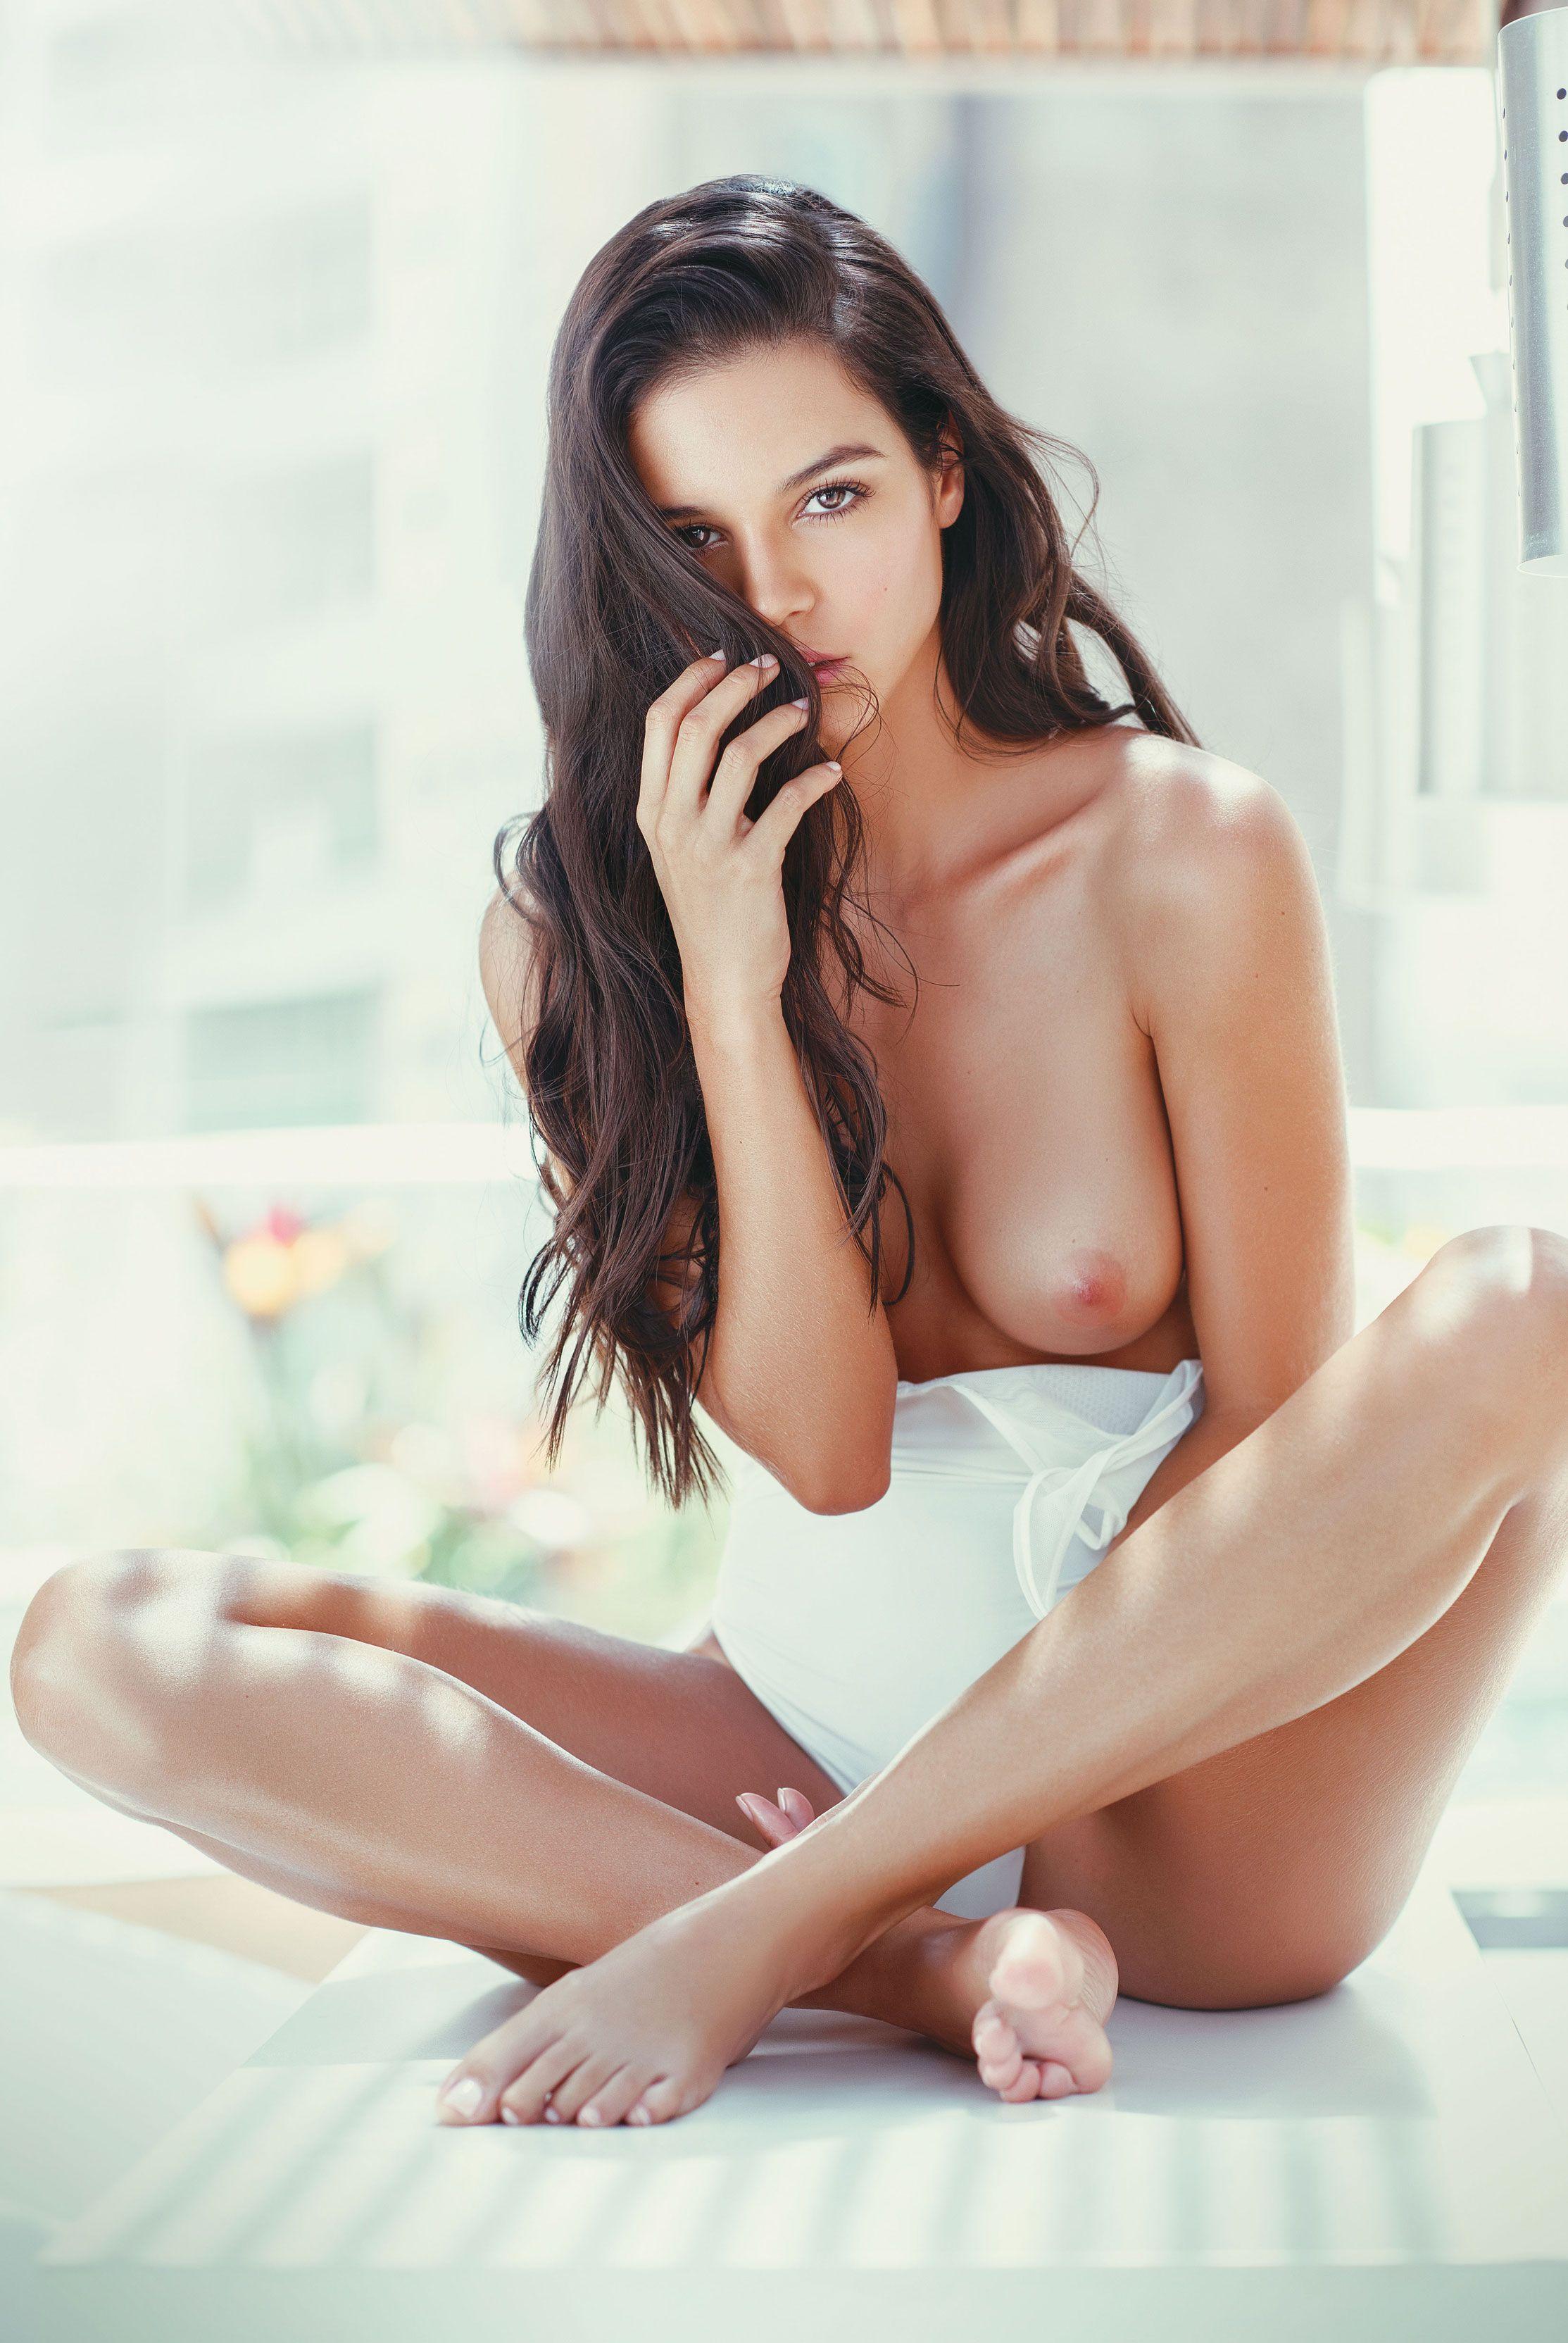 kvinnelige anal sex india